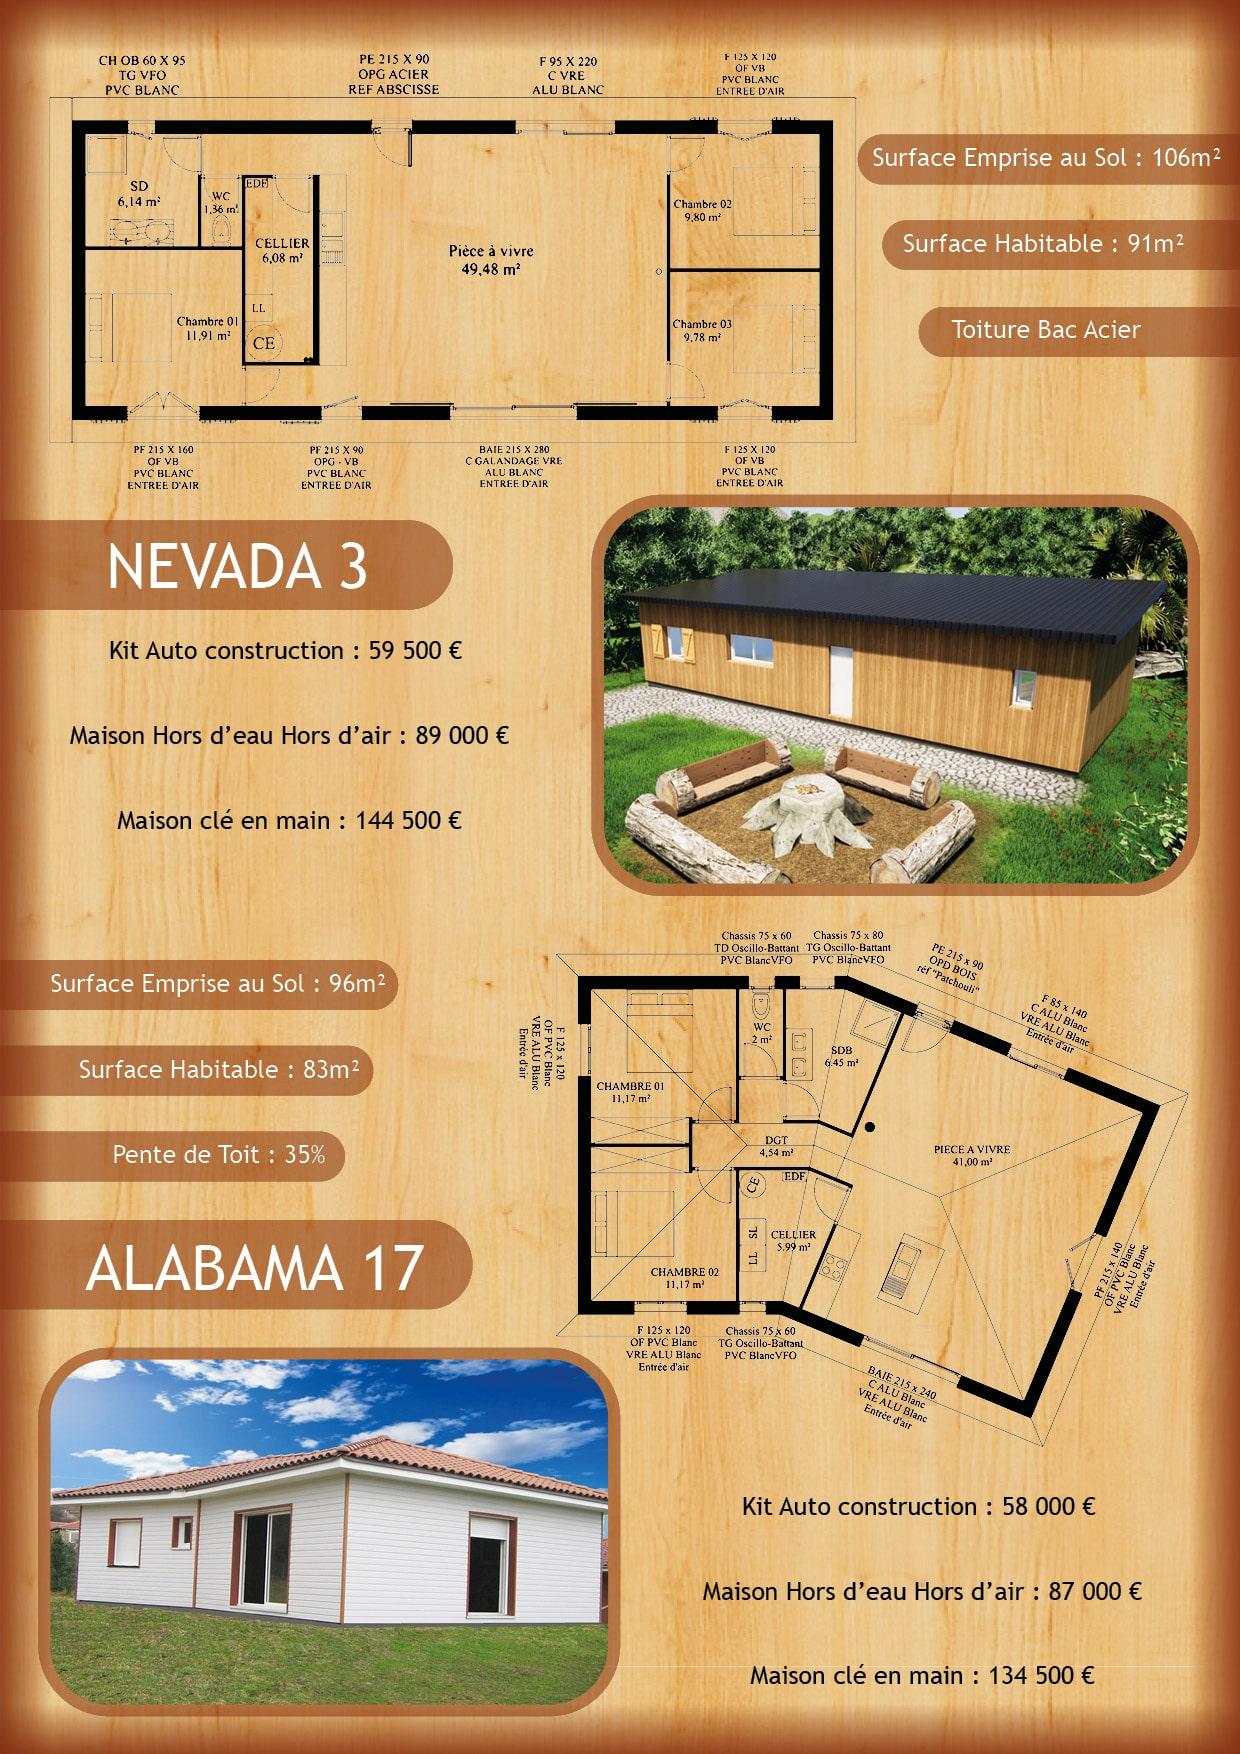 Tarif modèle Alabama 17 et Nevada 20